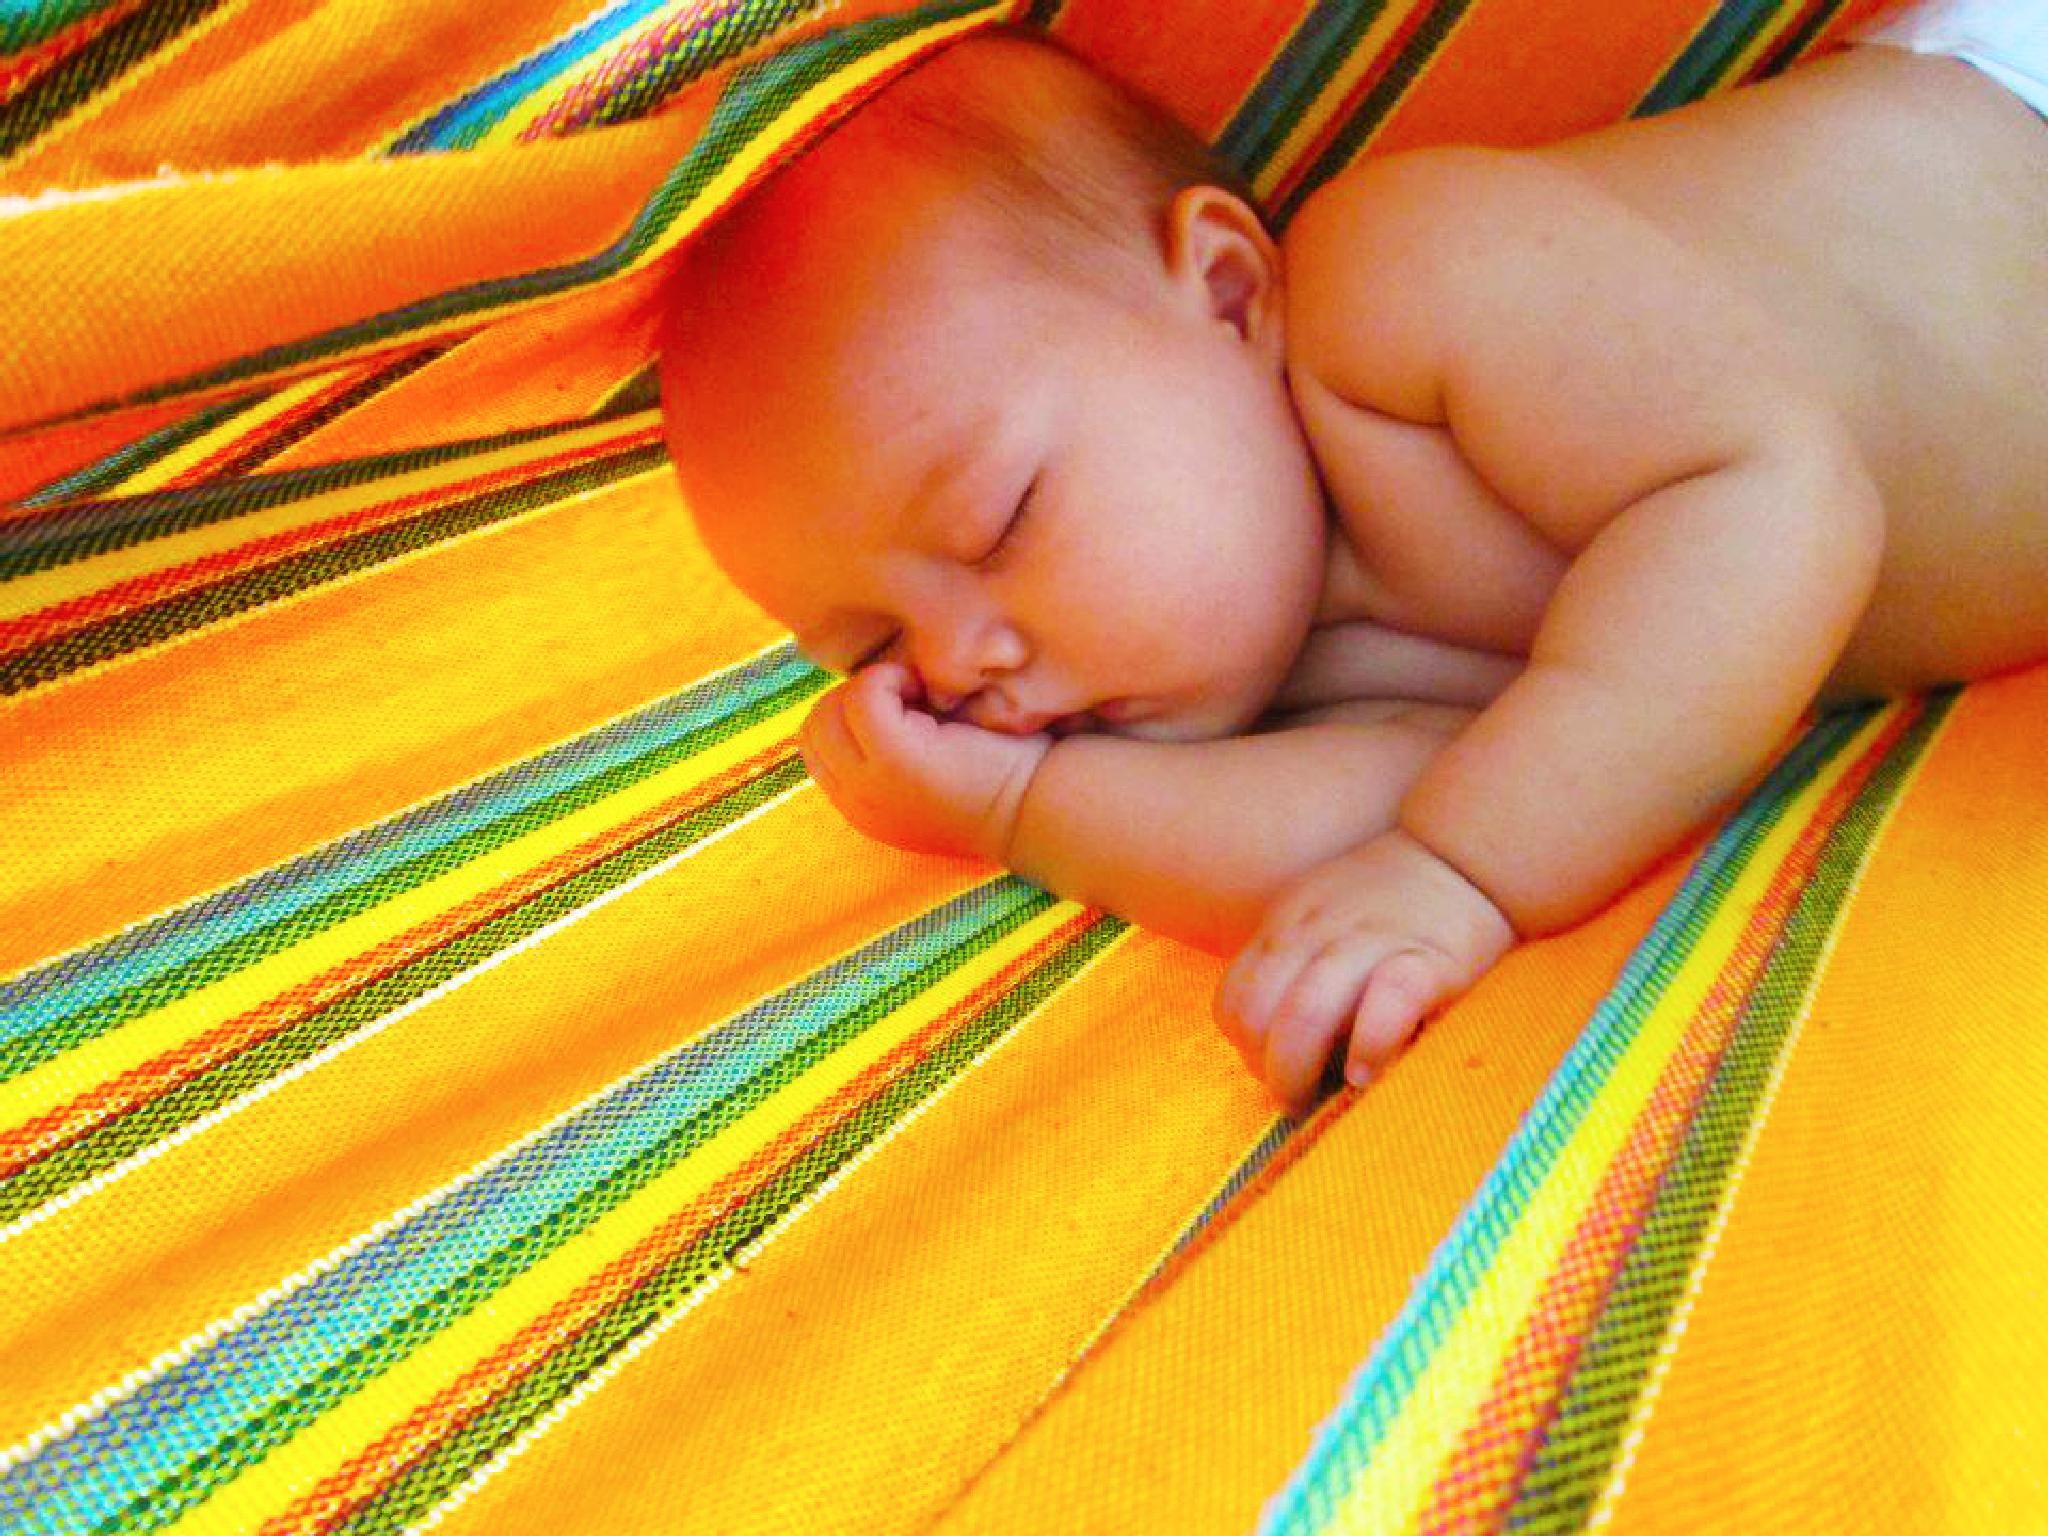 Baby by Luisk Ortega